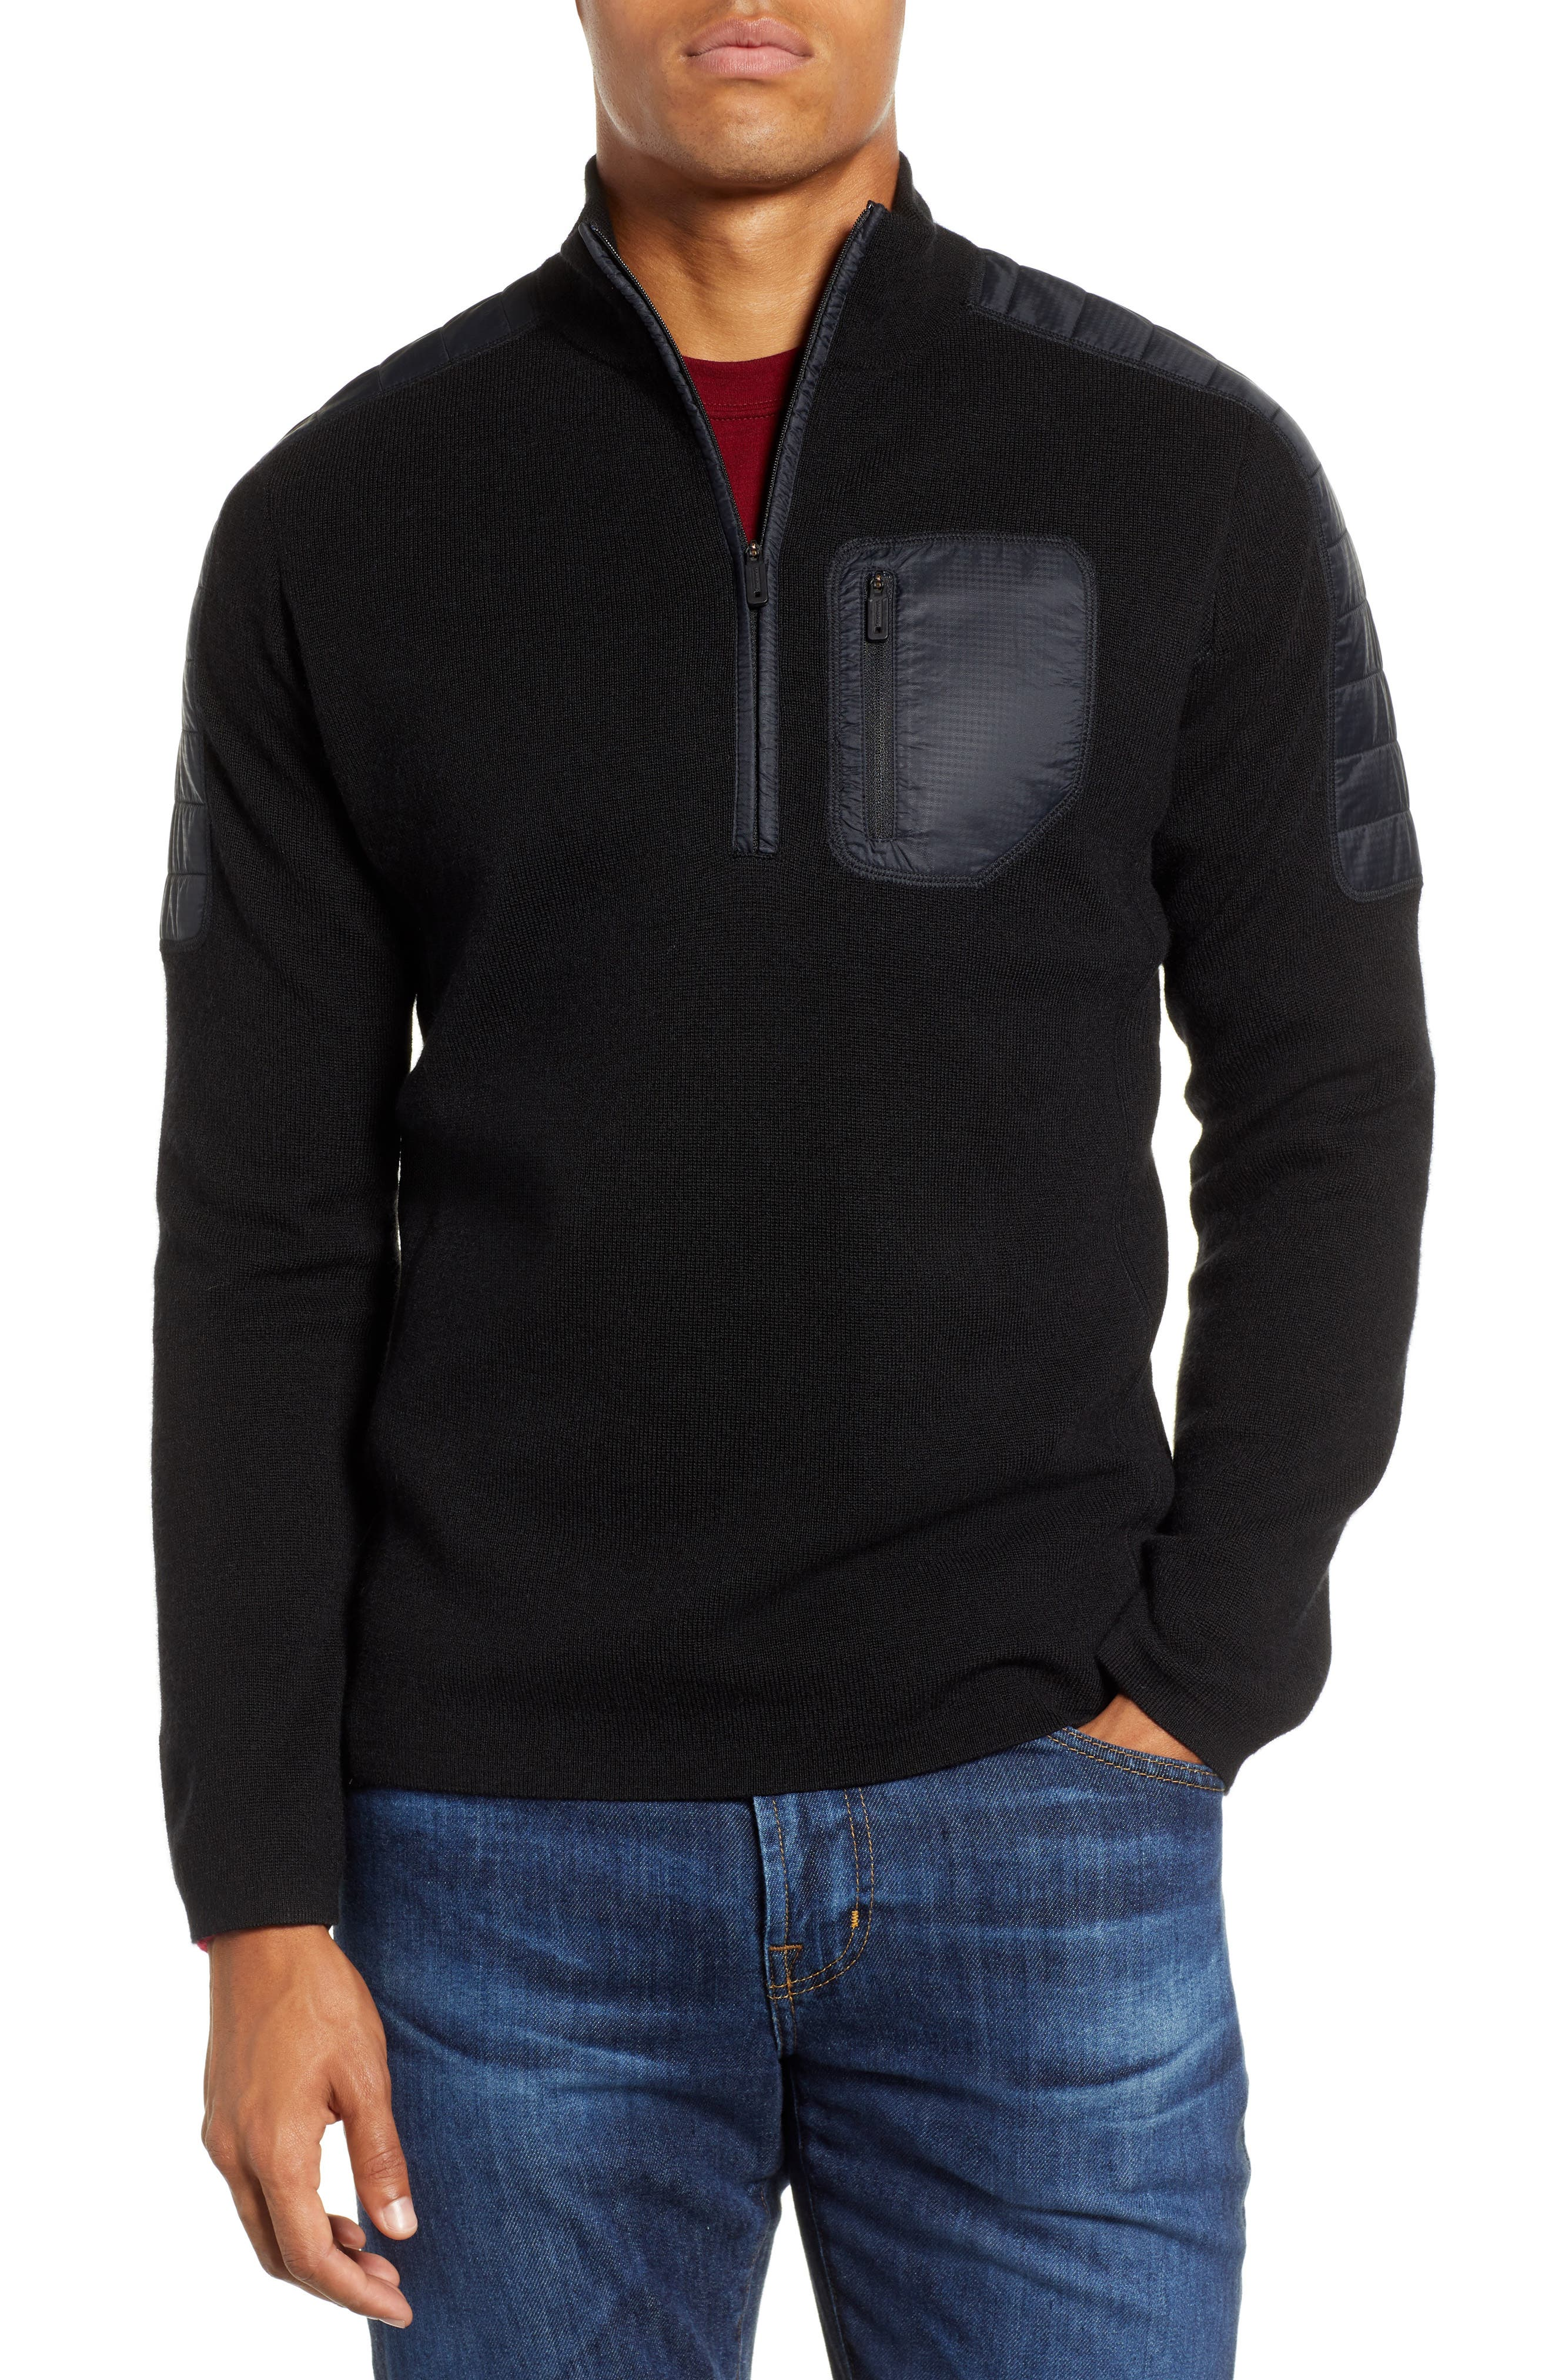 SMARTWOOL,                             Ski Ninja Pullover Sweater,                             Main thumbnail 1, color,                             BLACK